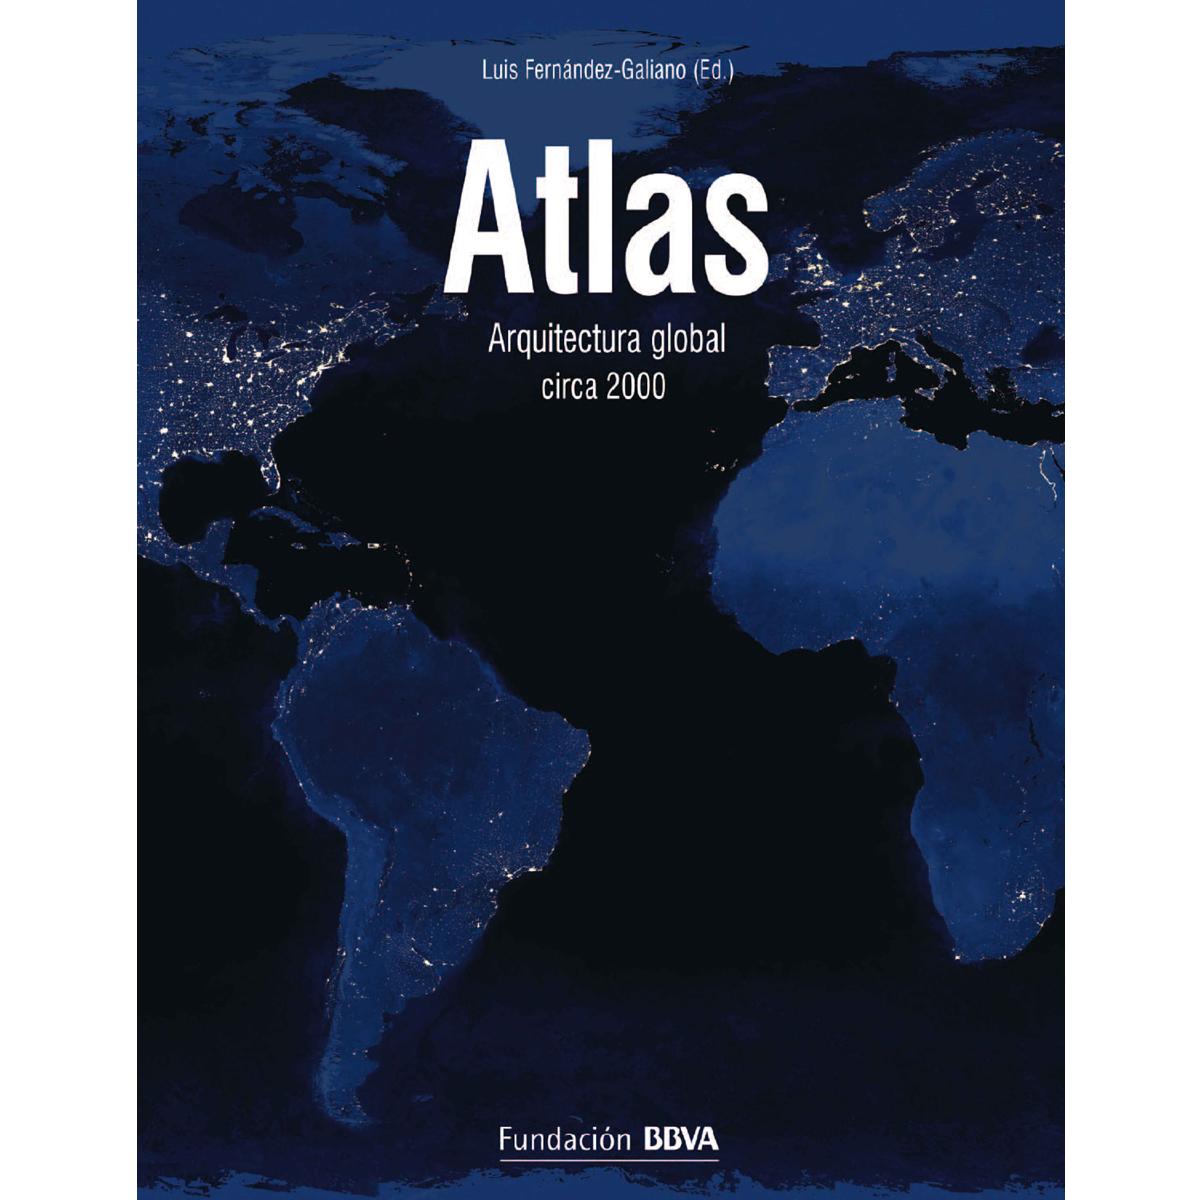 Atlas. Arquitectura global circa 2000